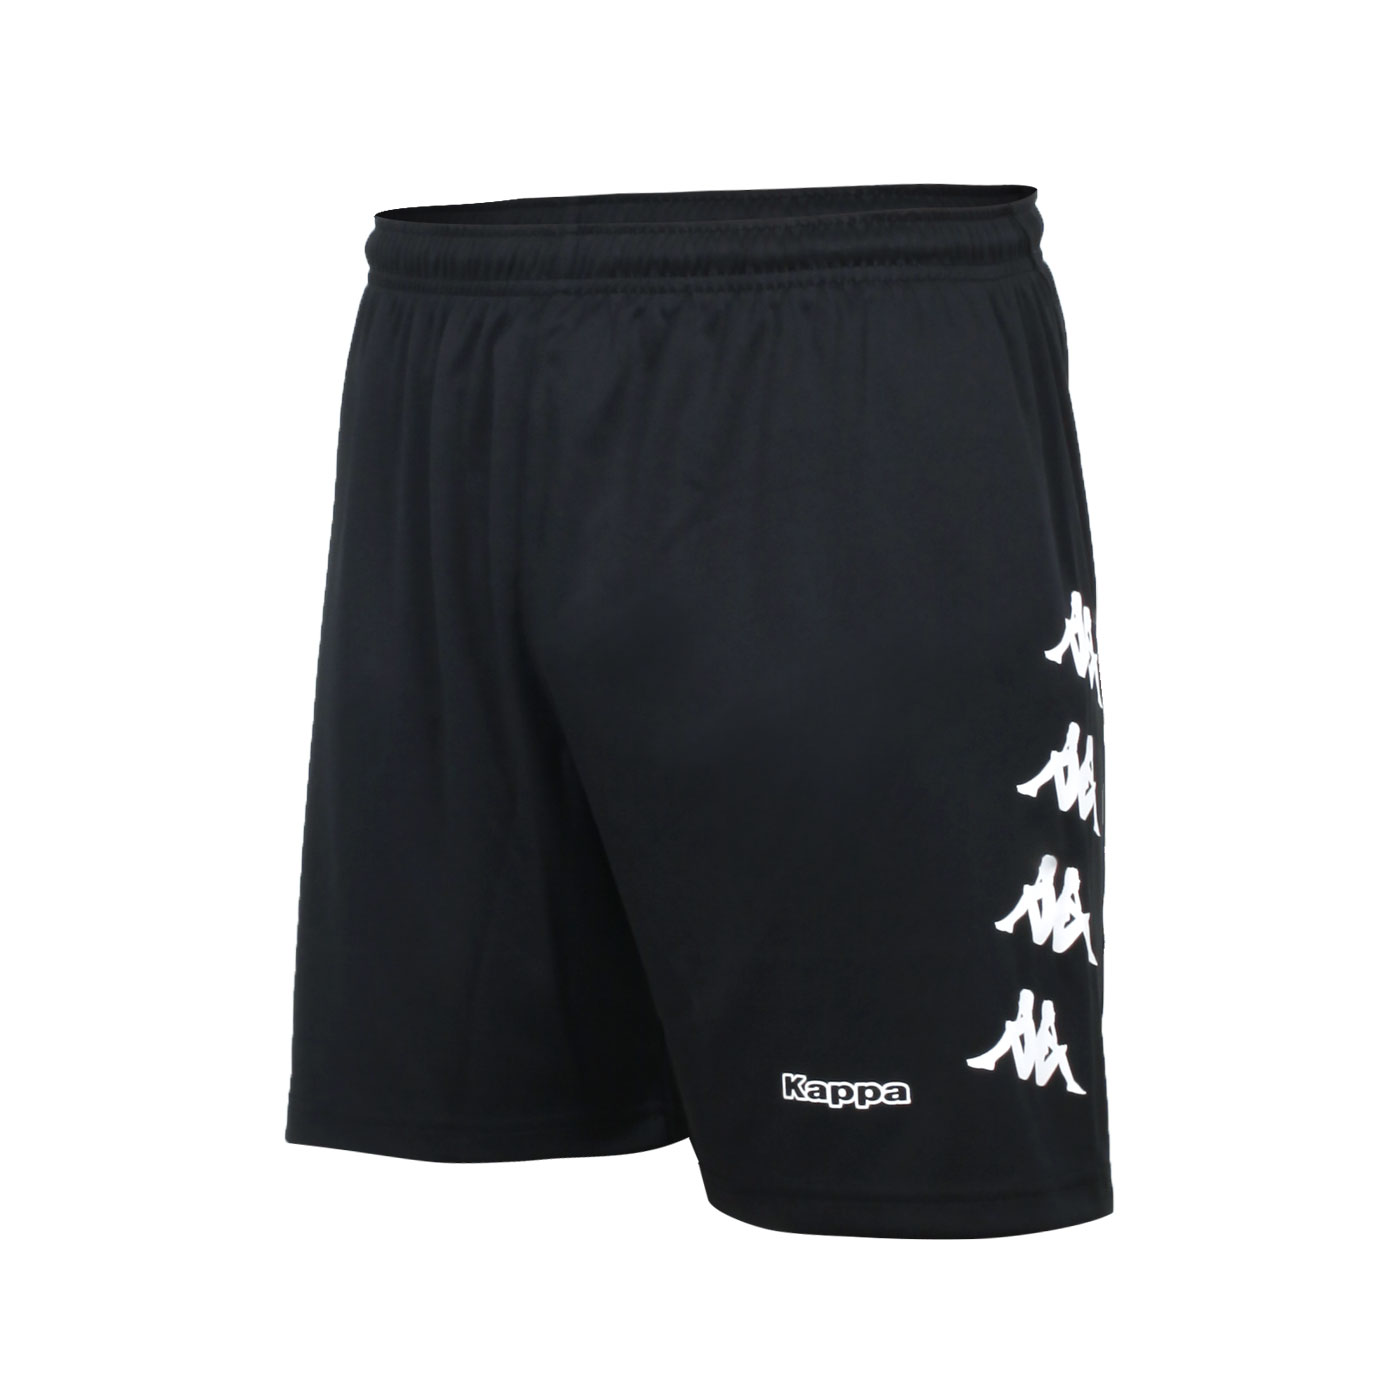 KAPPA 男款K4T運動針織短褲 32166YW-005